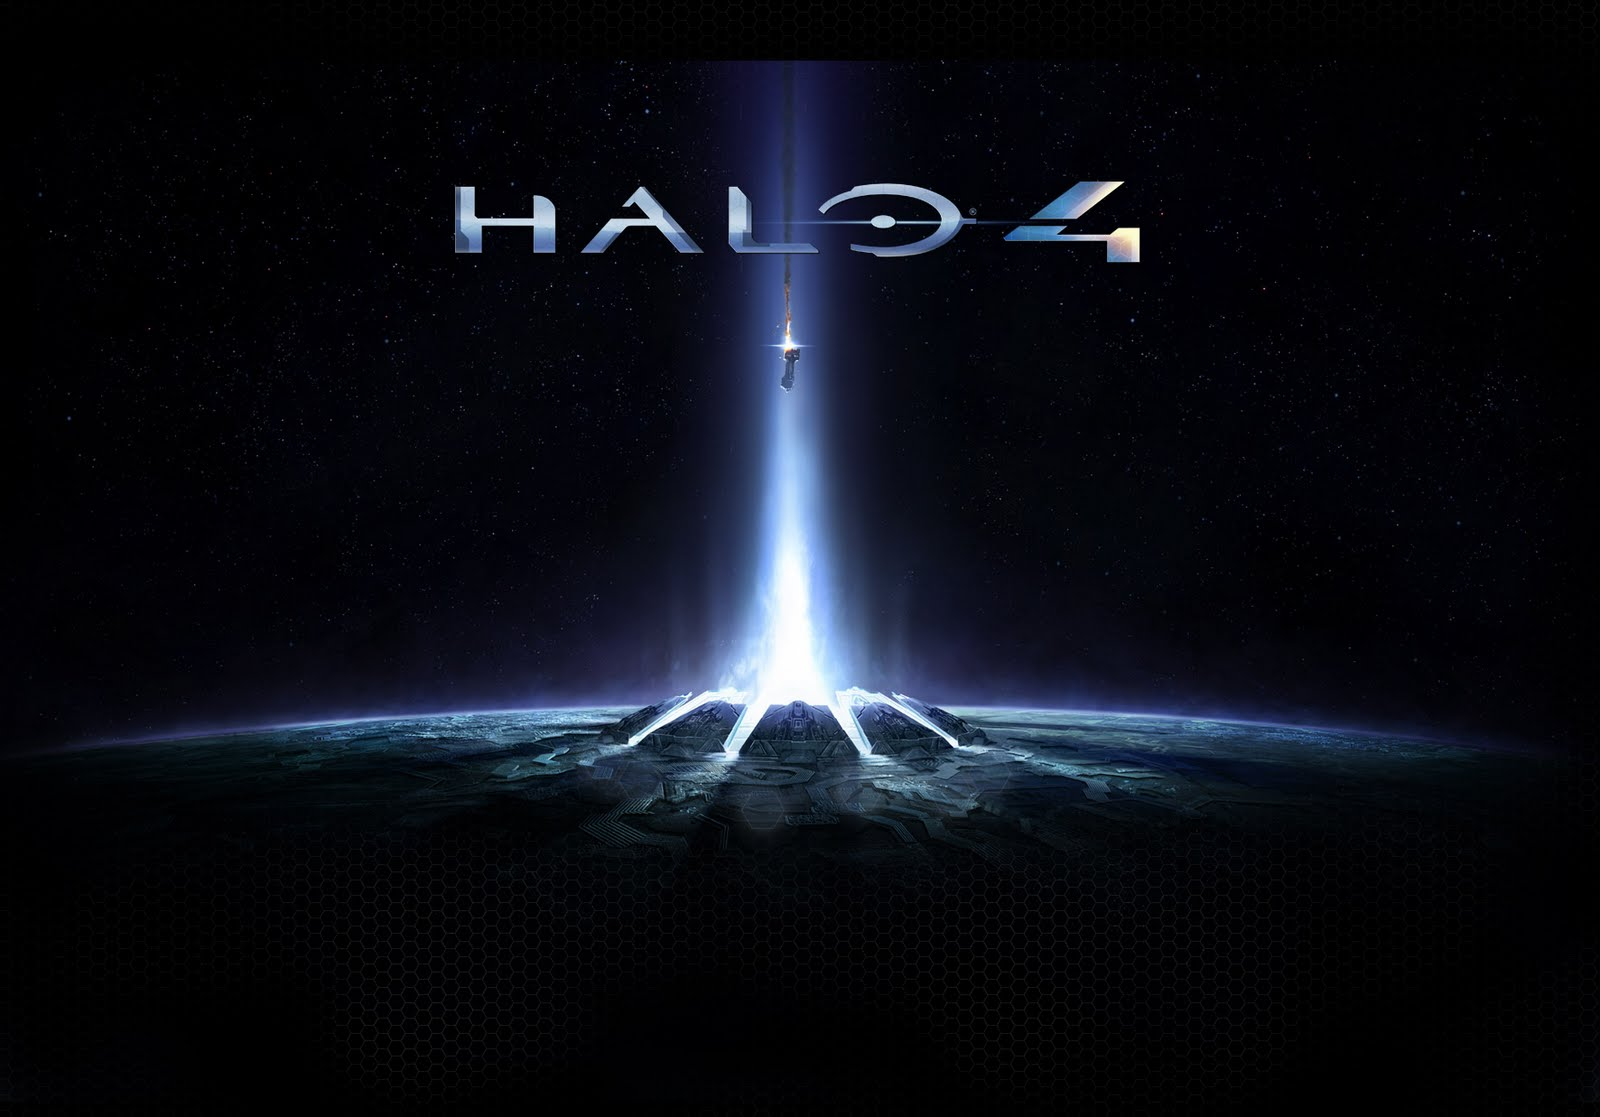 Halo 4 Wallpaper 1772x1237px 1600x1117